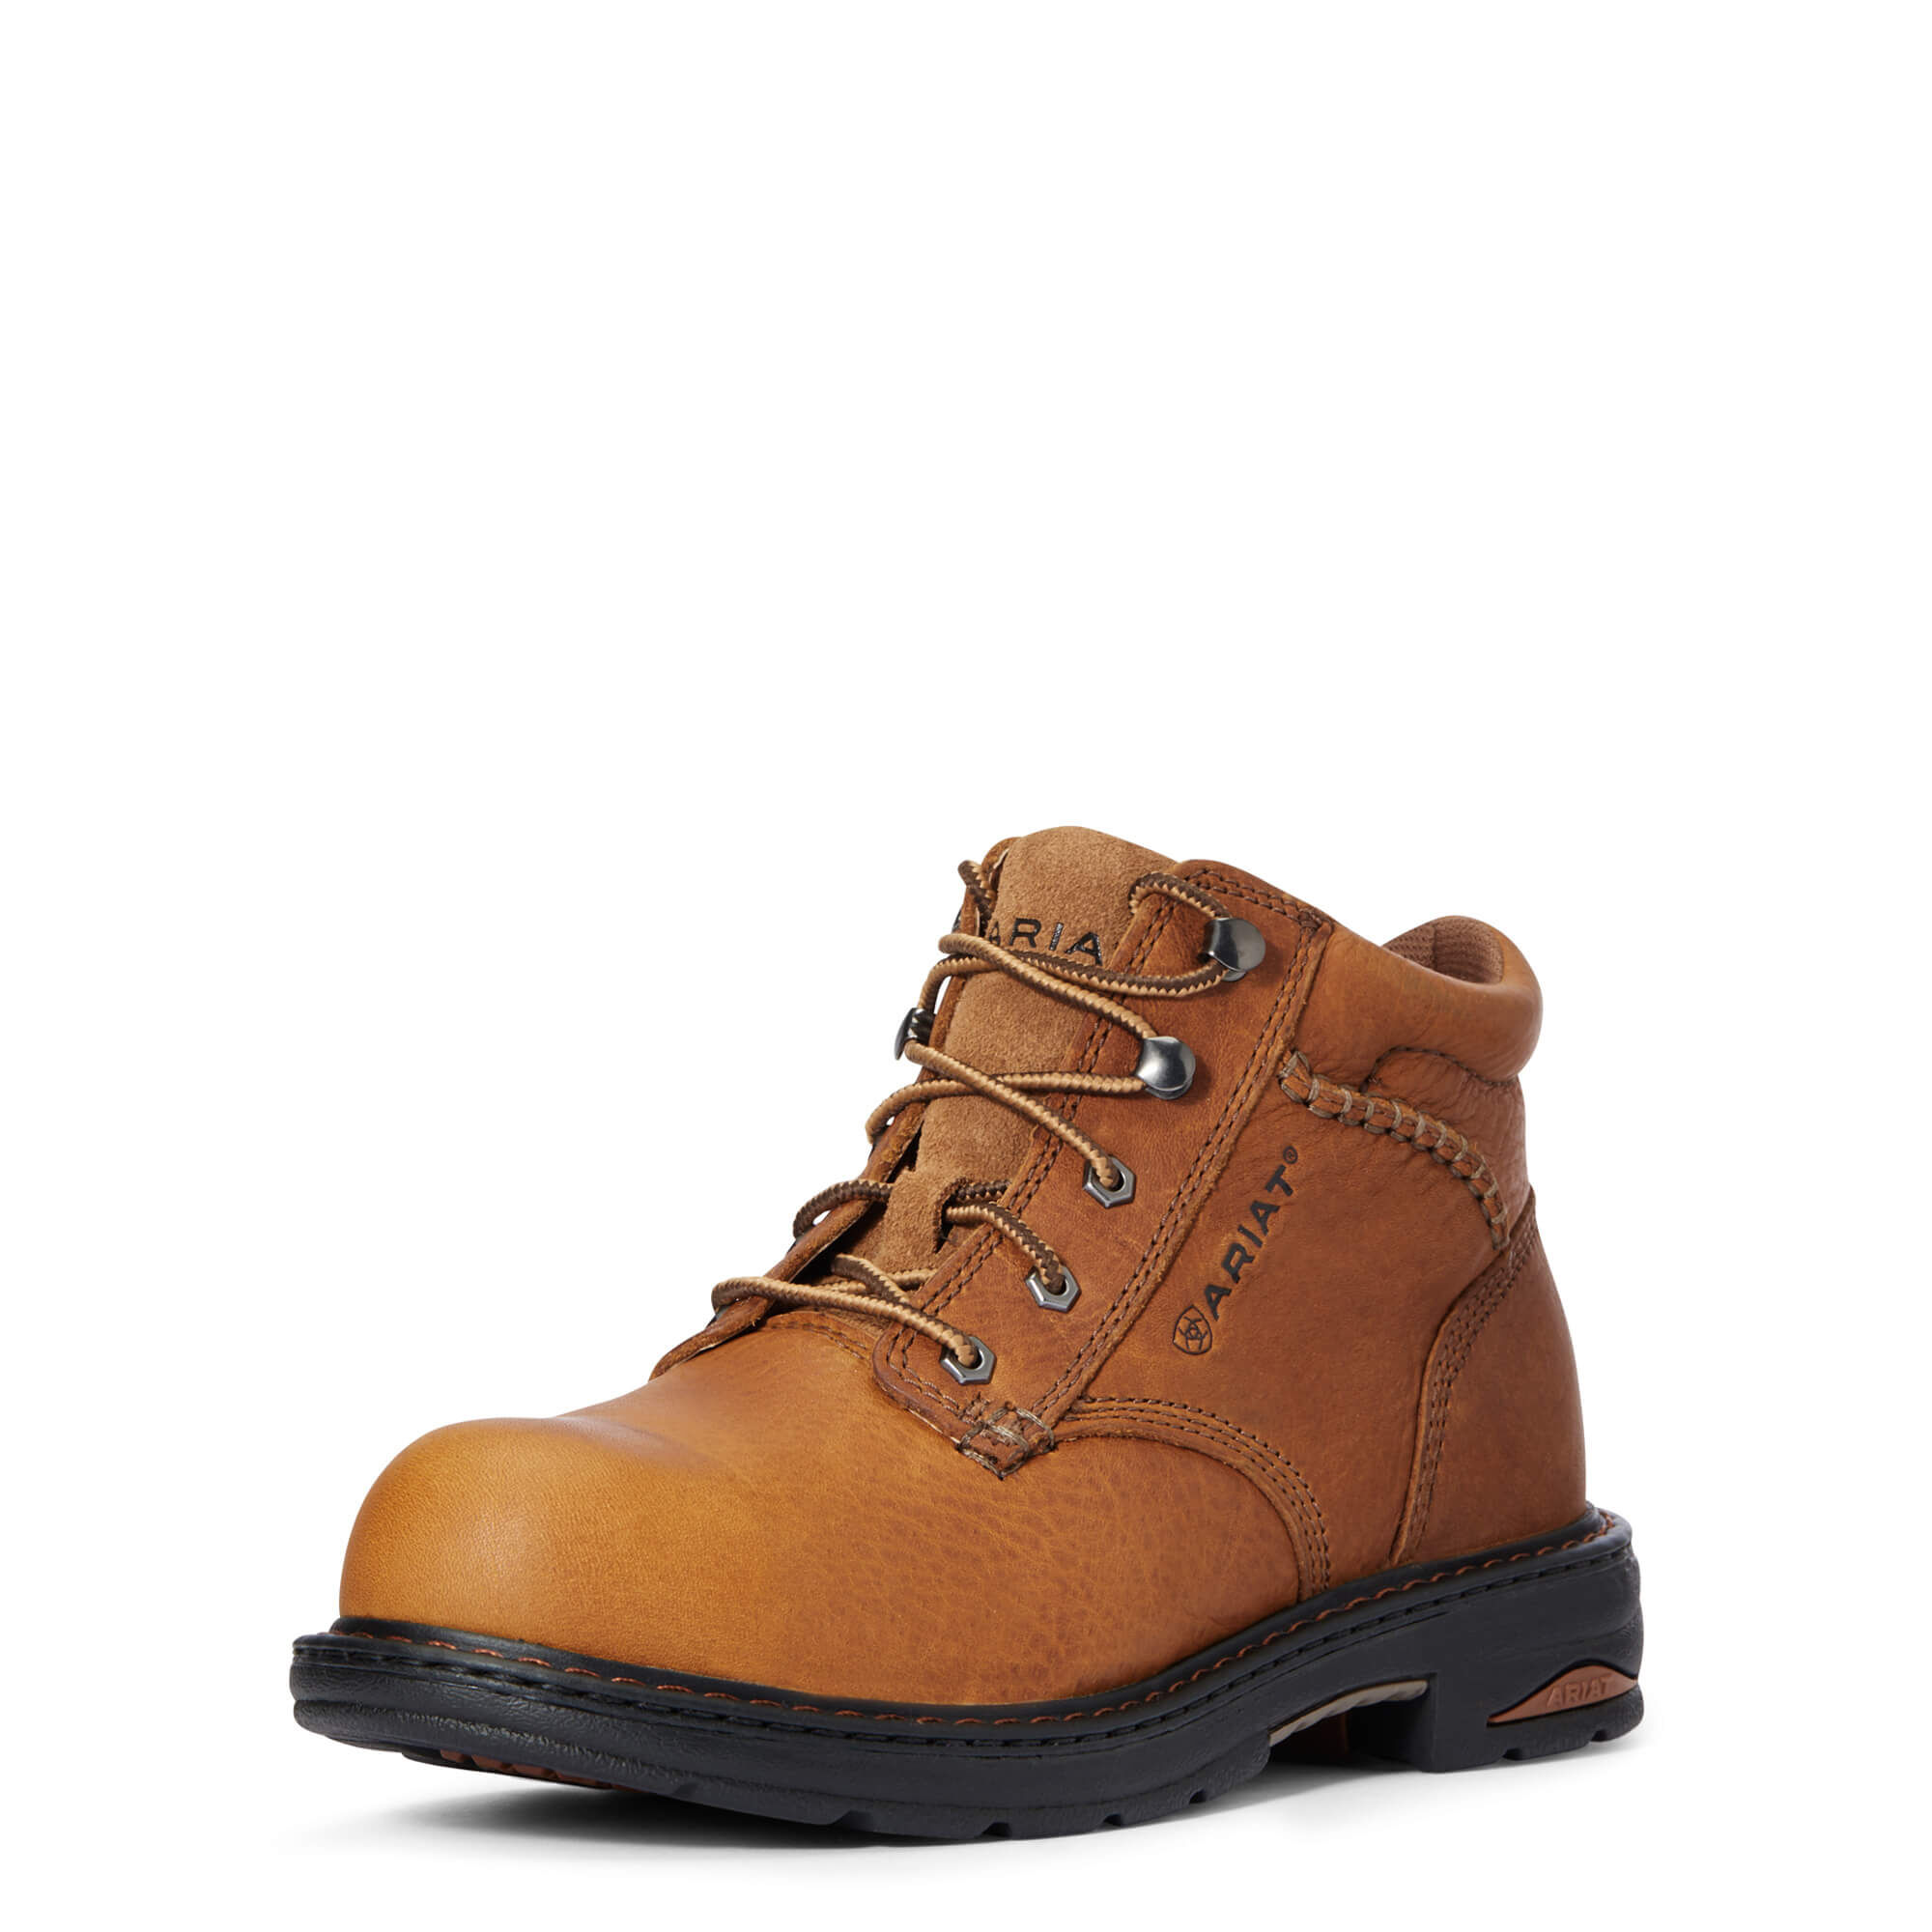 Women's Construction Boots - Ariat